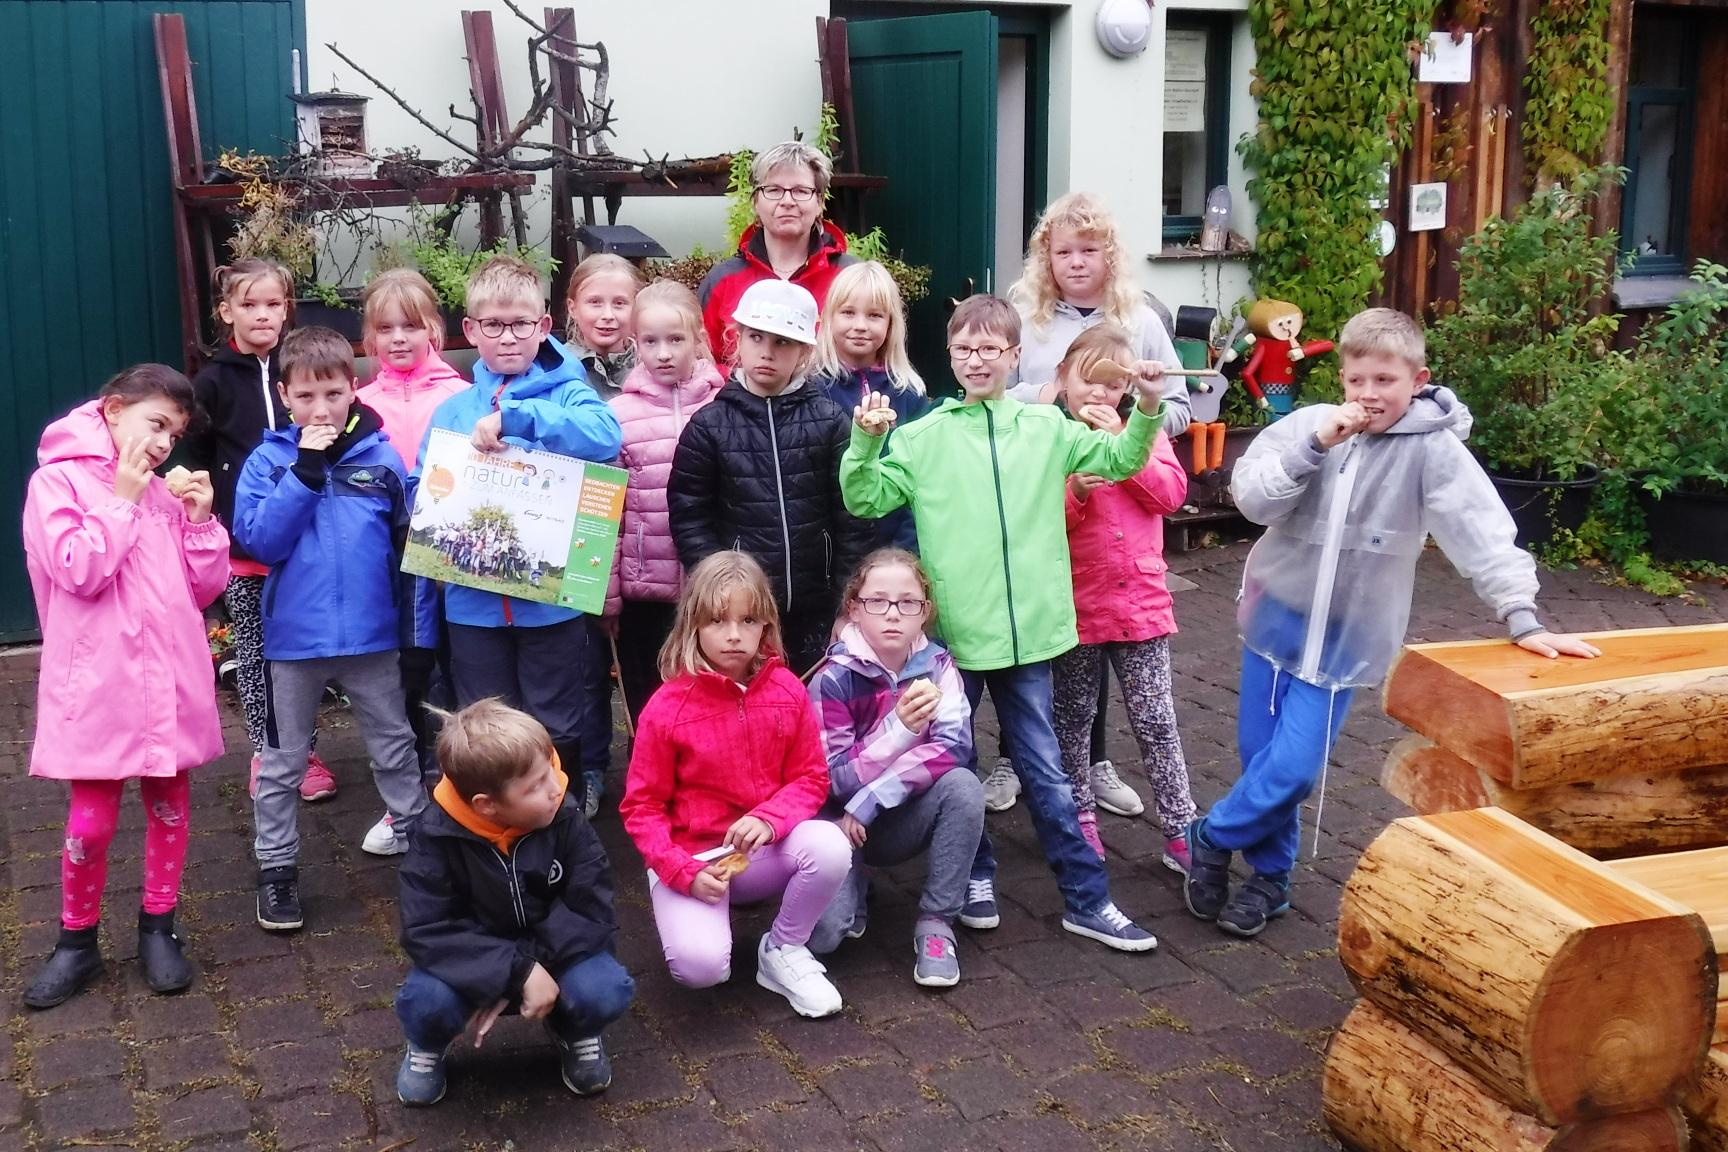 Grundschule Strehla in Naundorf